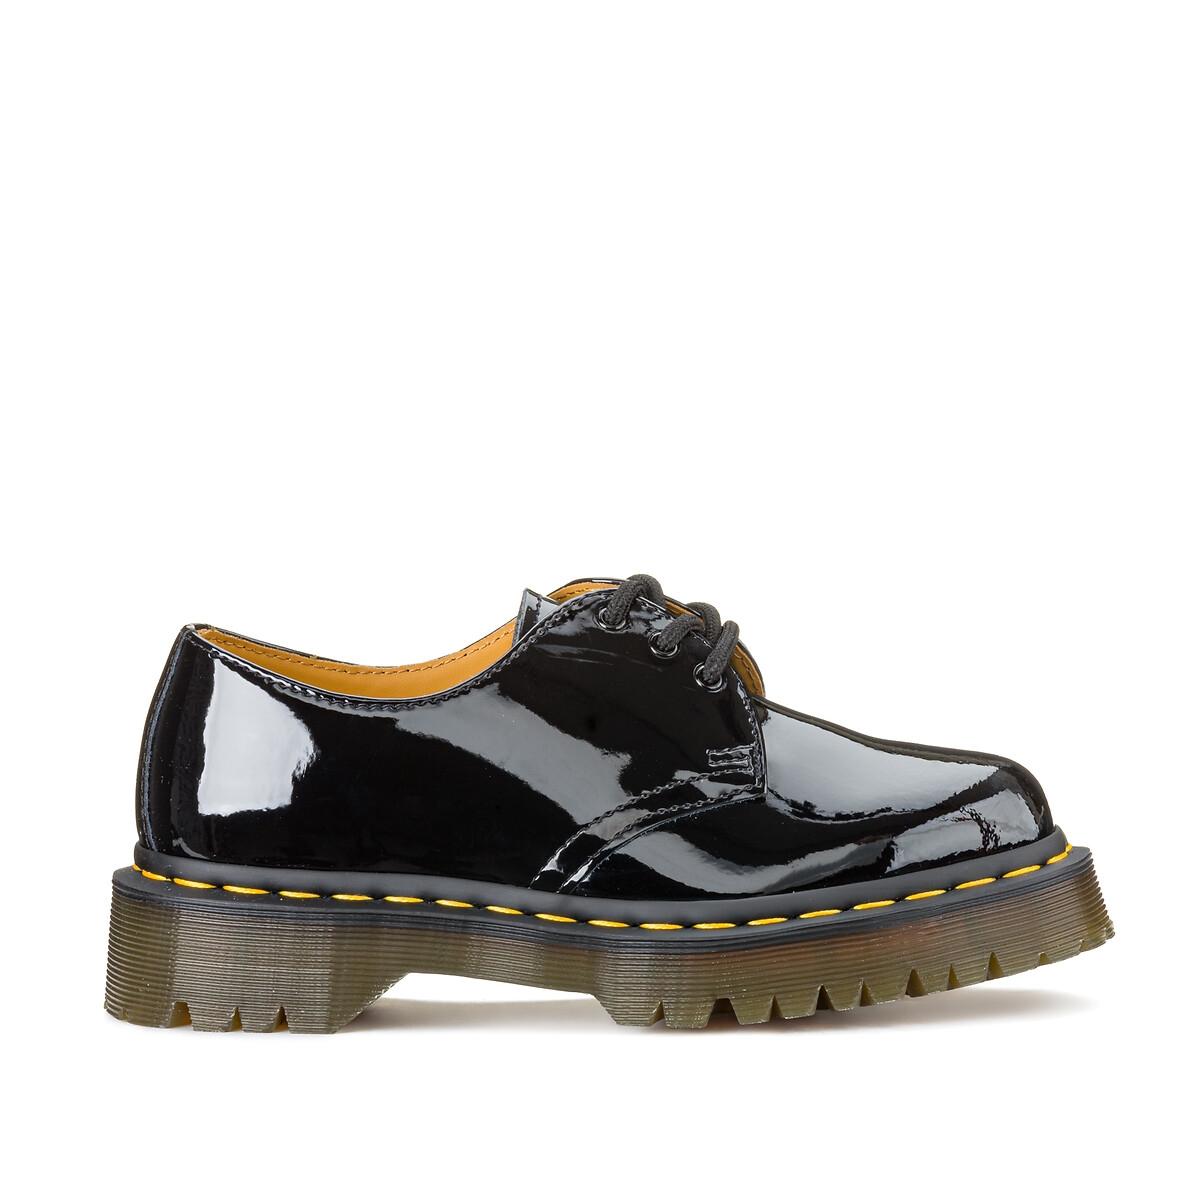 Ботинки-дерби LaRedoute Из кожи 1461 Bex 42 черный ботинки дерби из кожи teadale maira